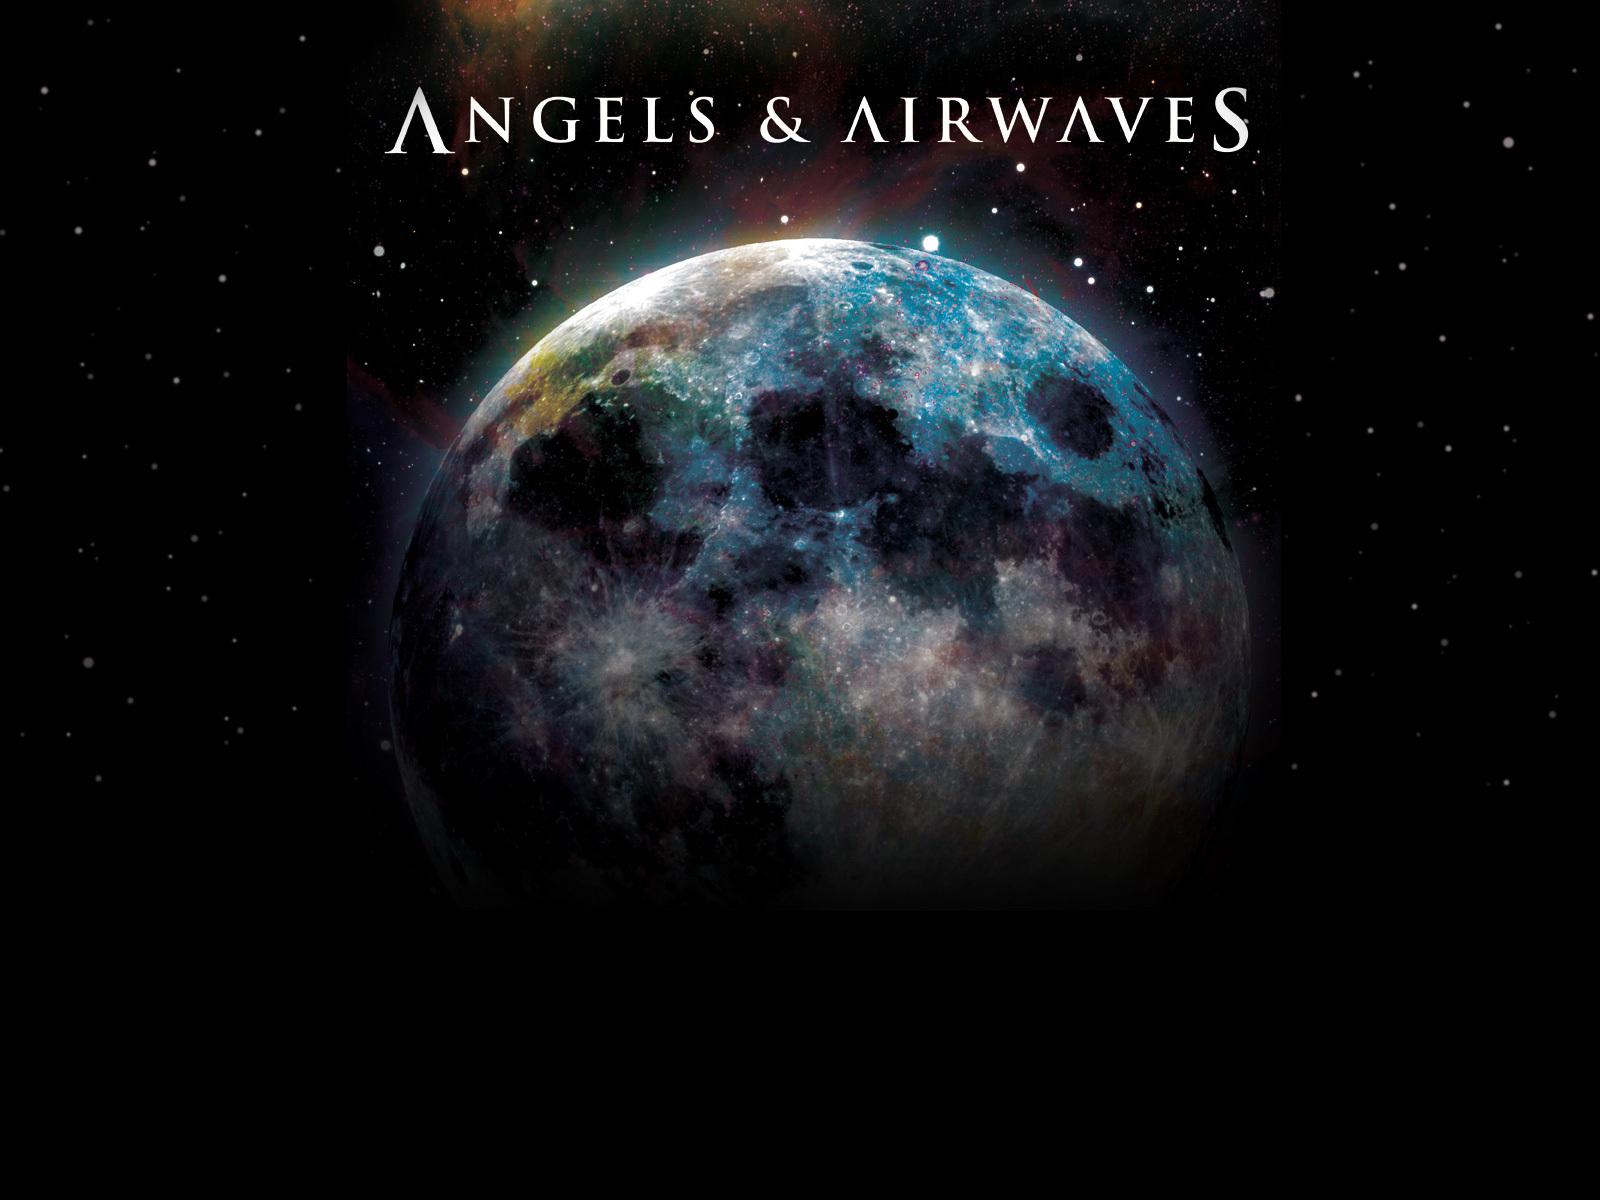 AVA Moon - Angels and Airwaves Wallpaper (1552887) - Fanpop